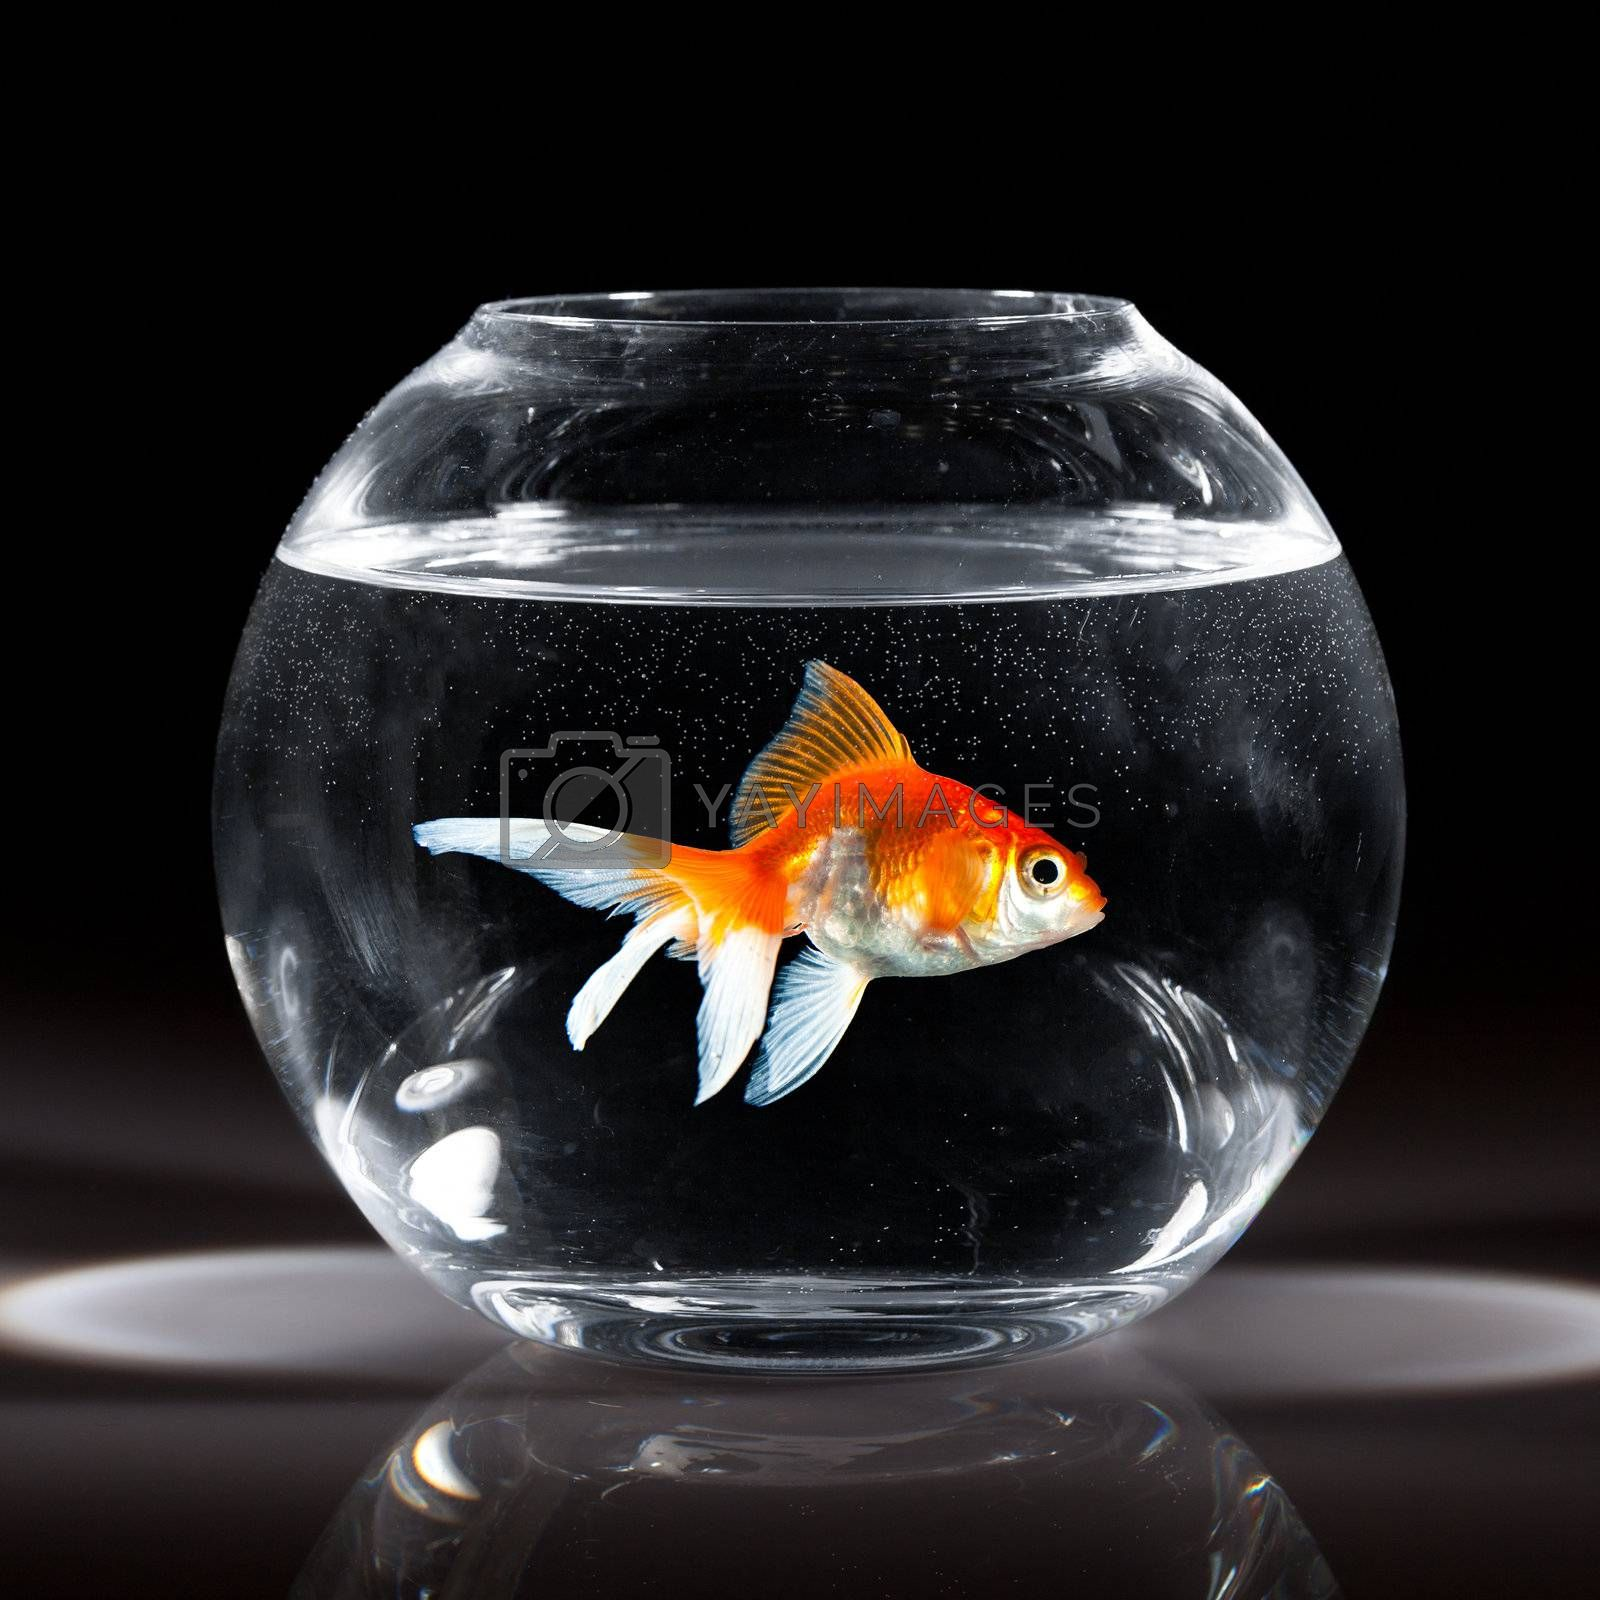 goldfish floats in an aquarium on a dark background